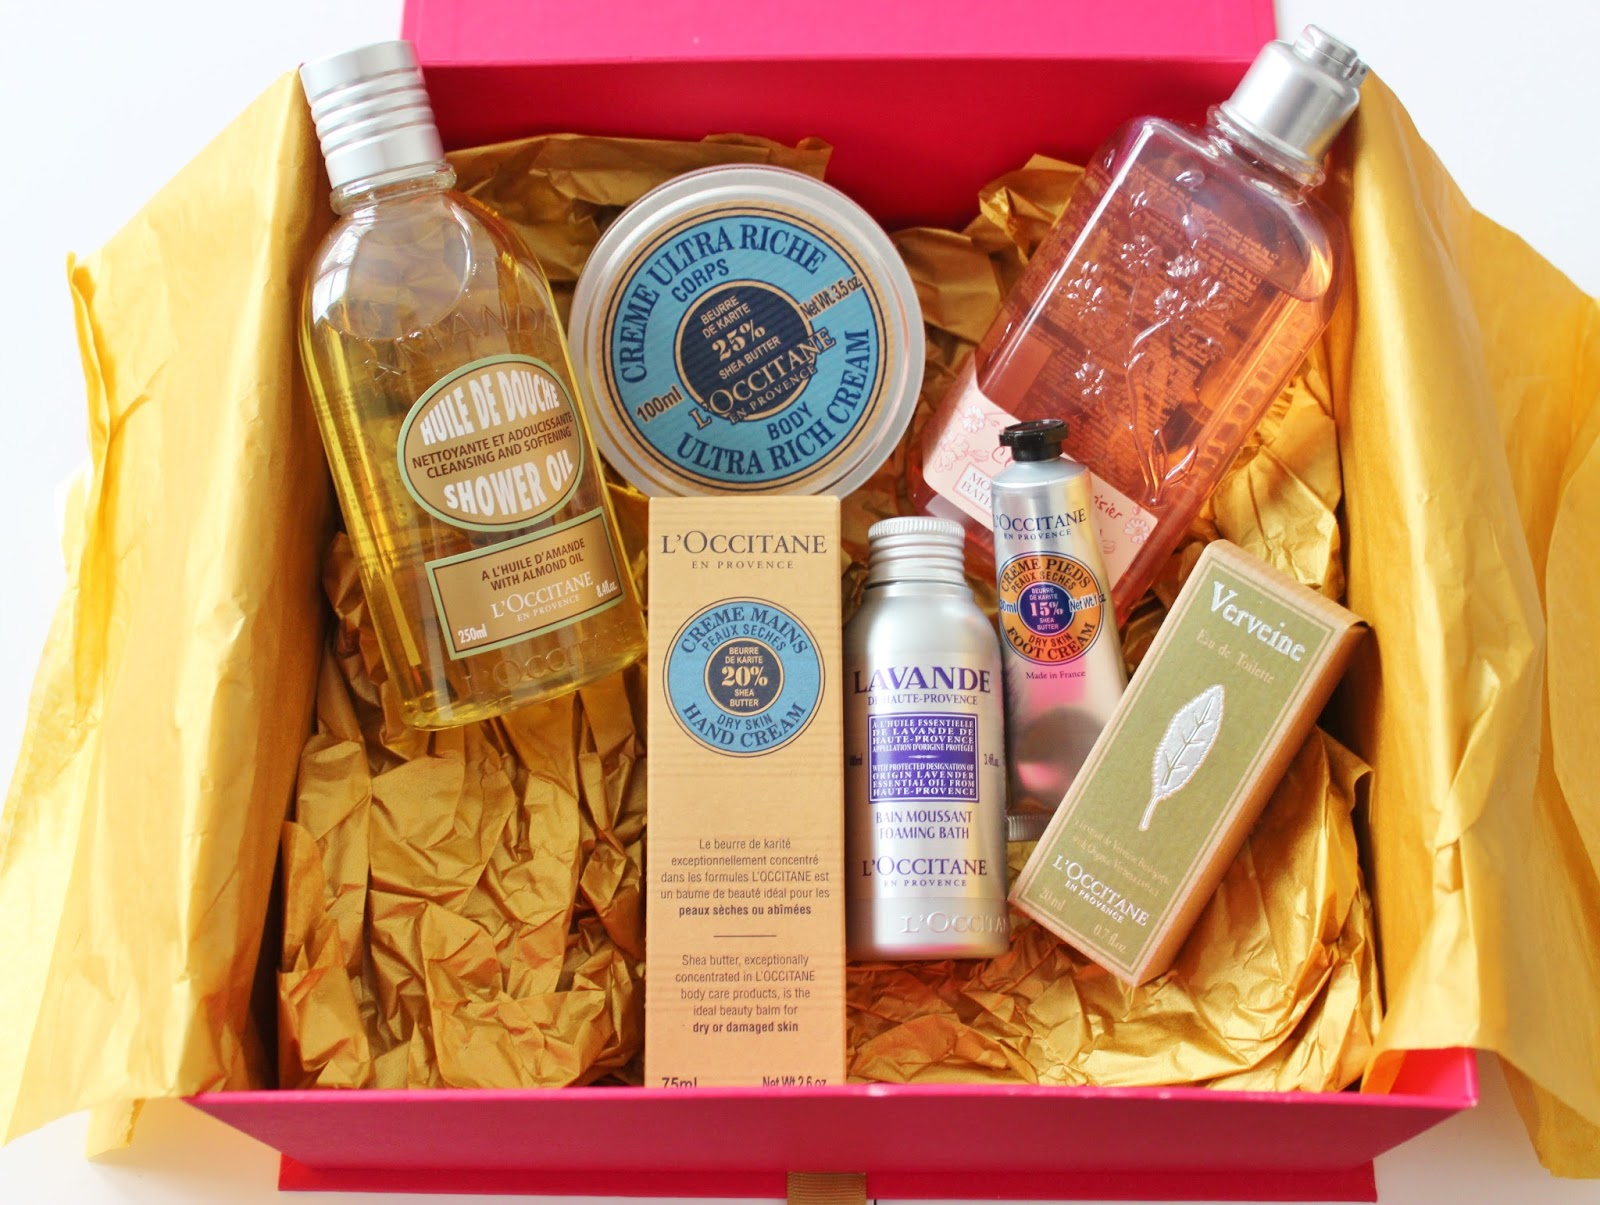 Loccitane christmas gift box surprise